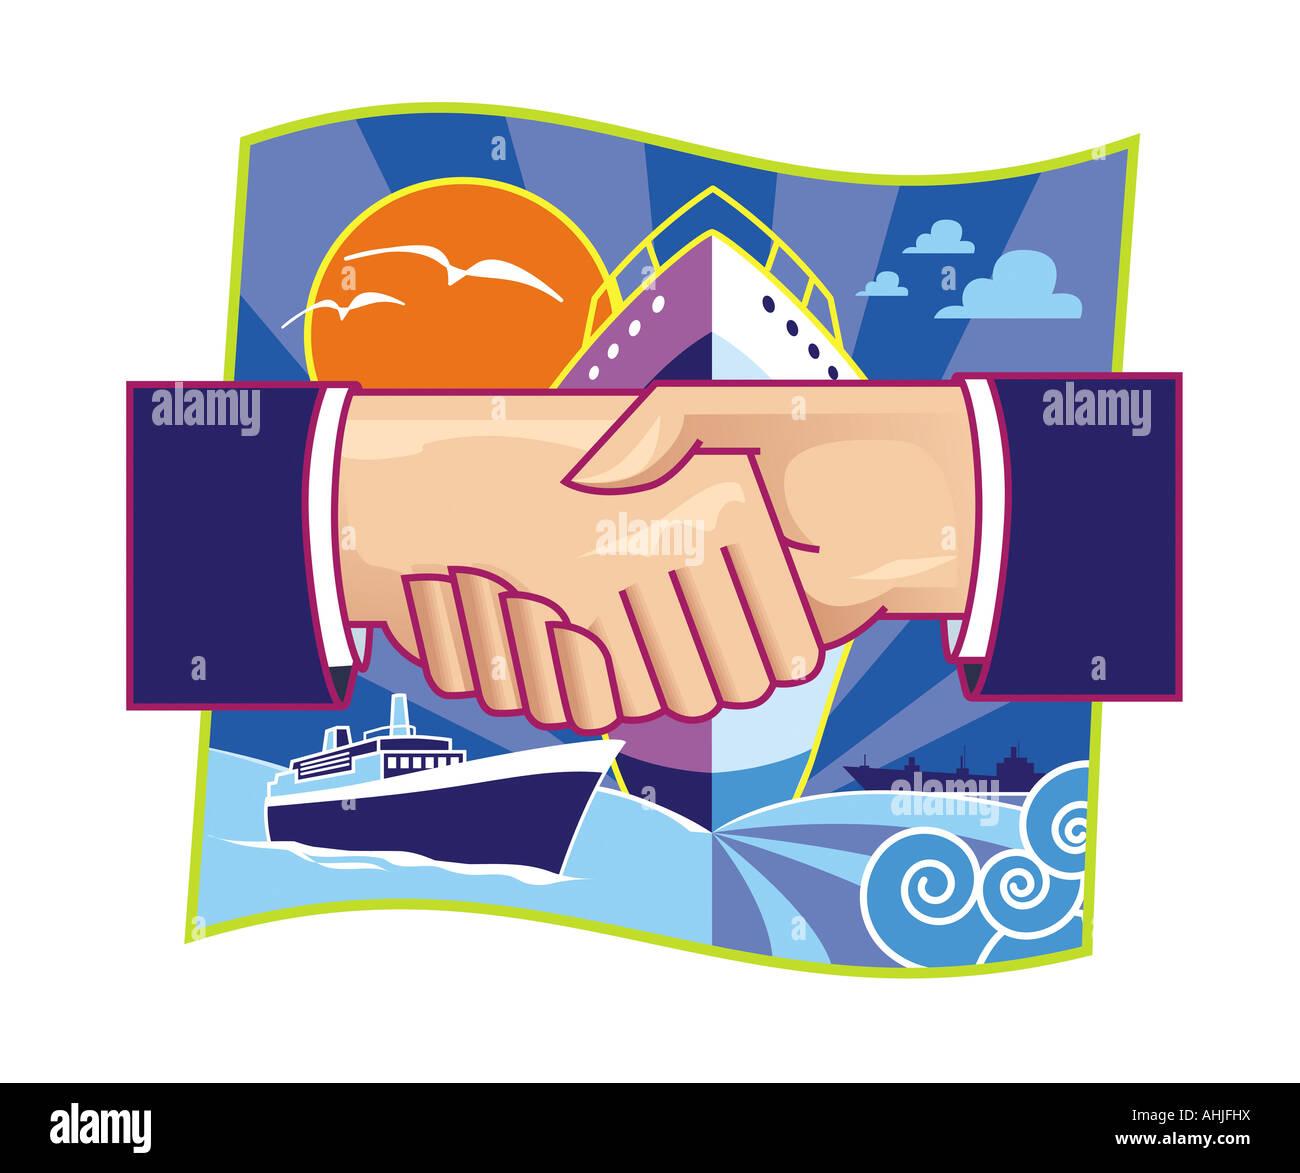 Shiping partnership illustration - Stock Image